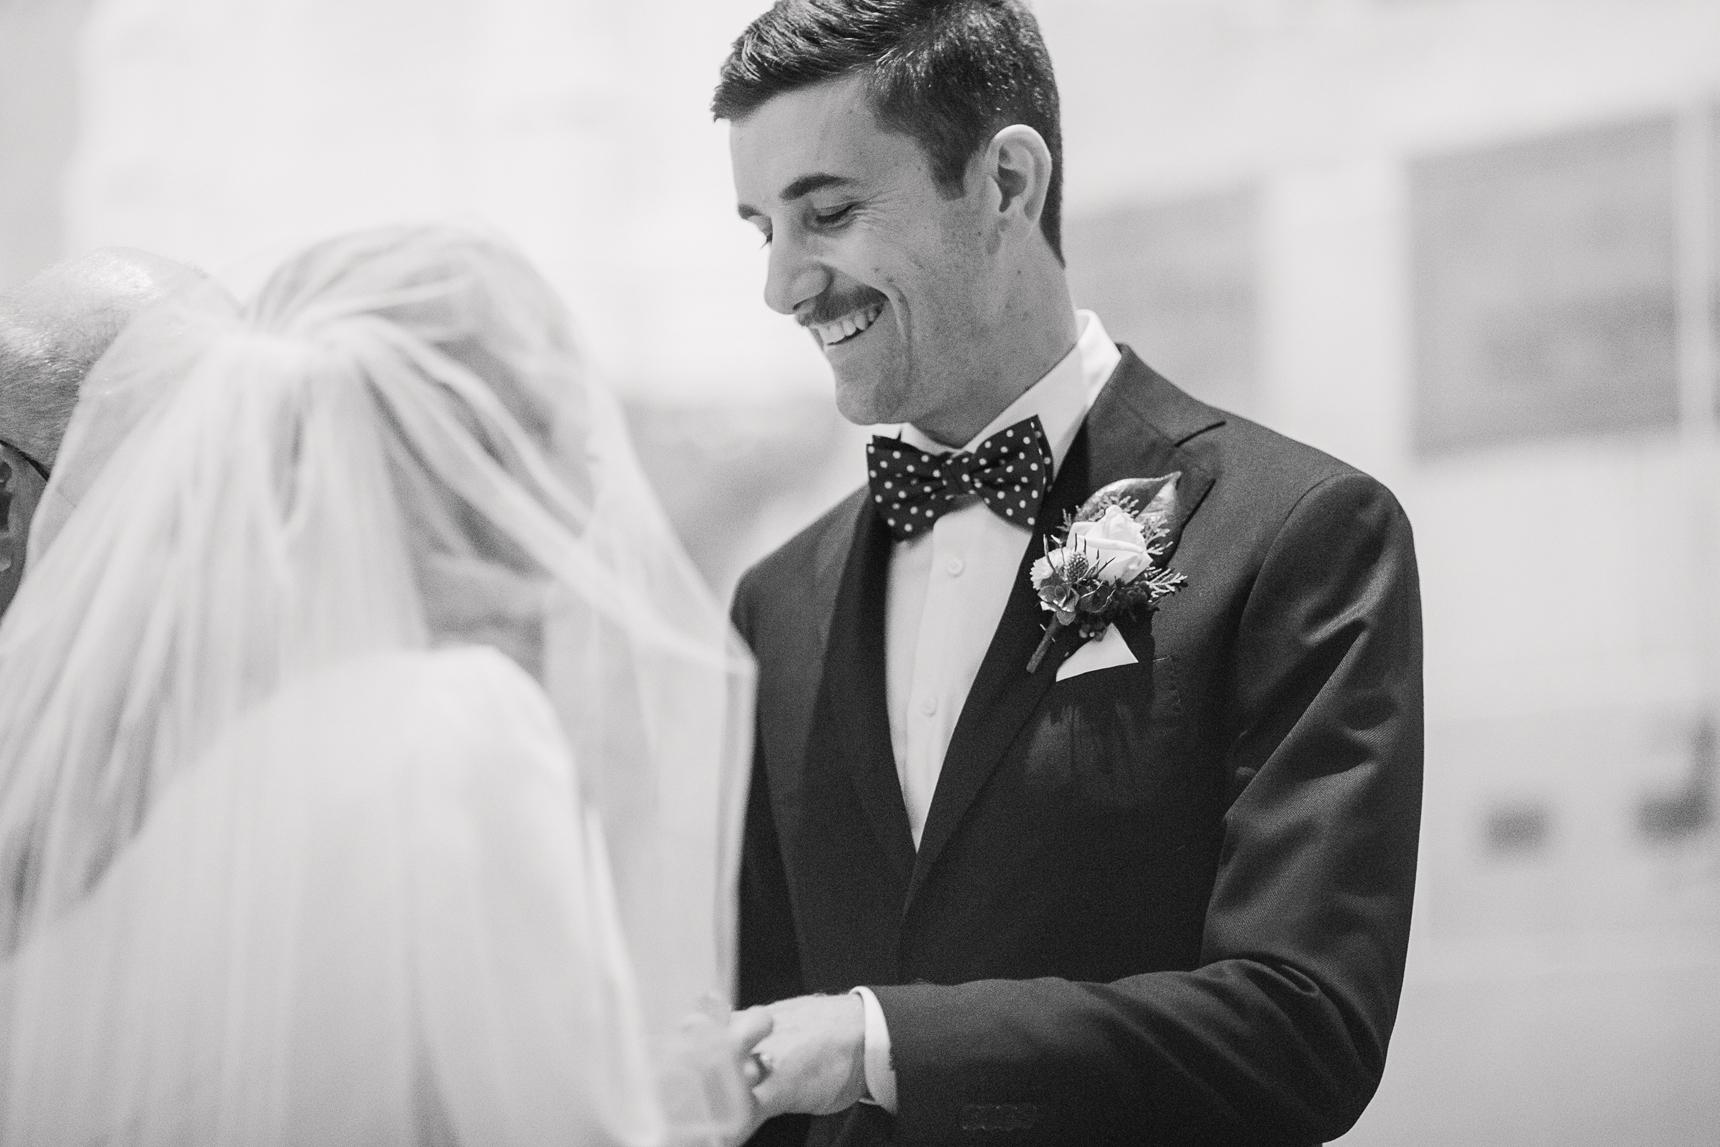 GregLana_ViewBySydney_WeddingPhotography036.jpg